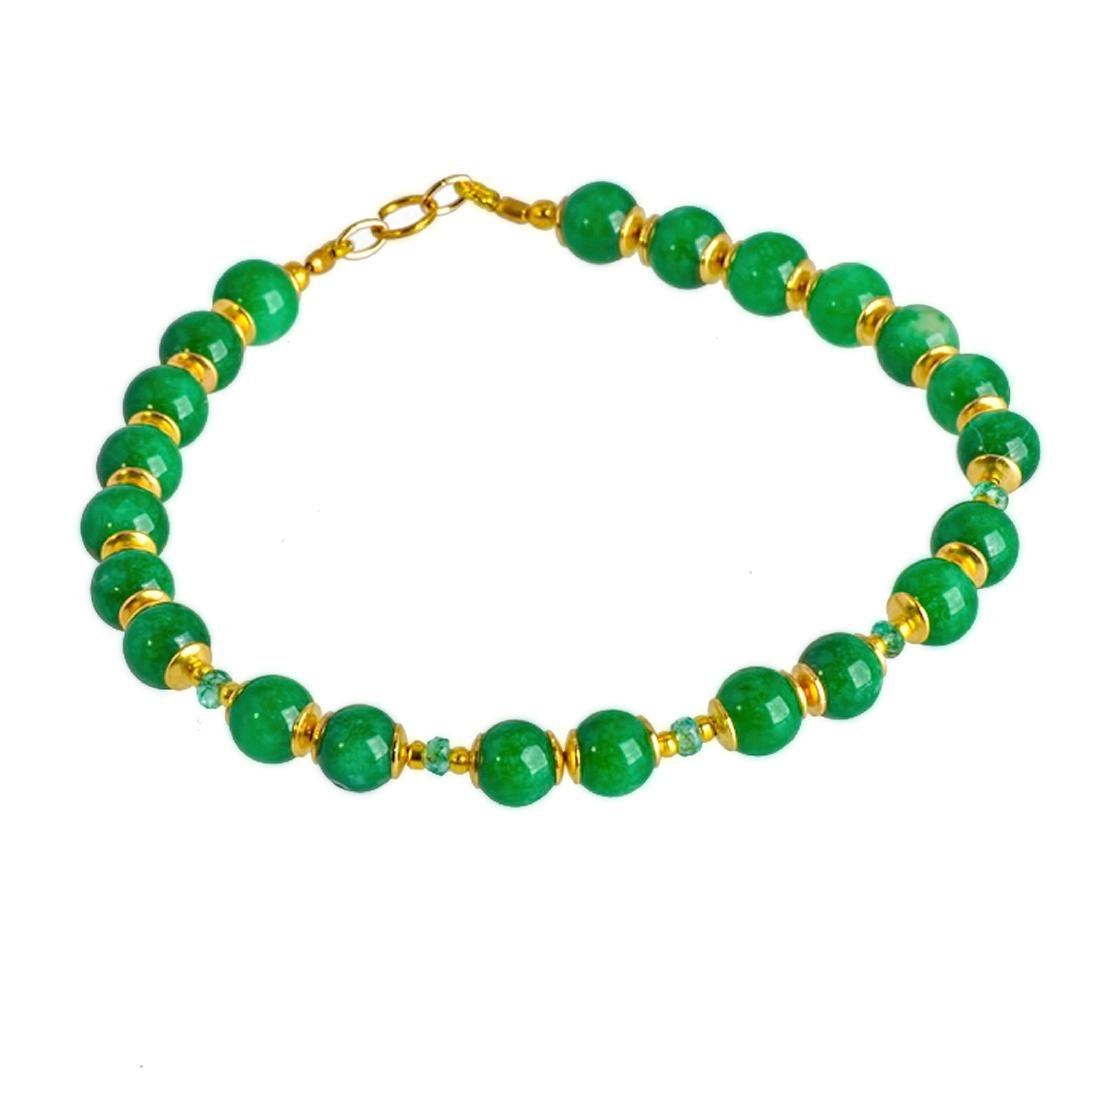 14K Gold Imperial Emerald Green Jade Bracelet